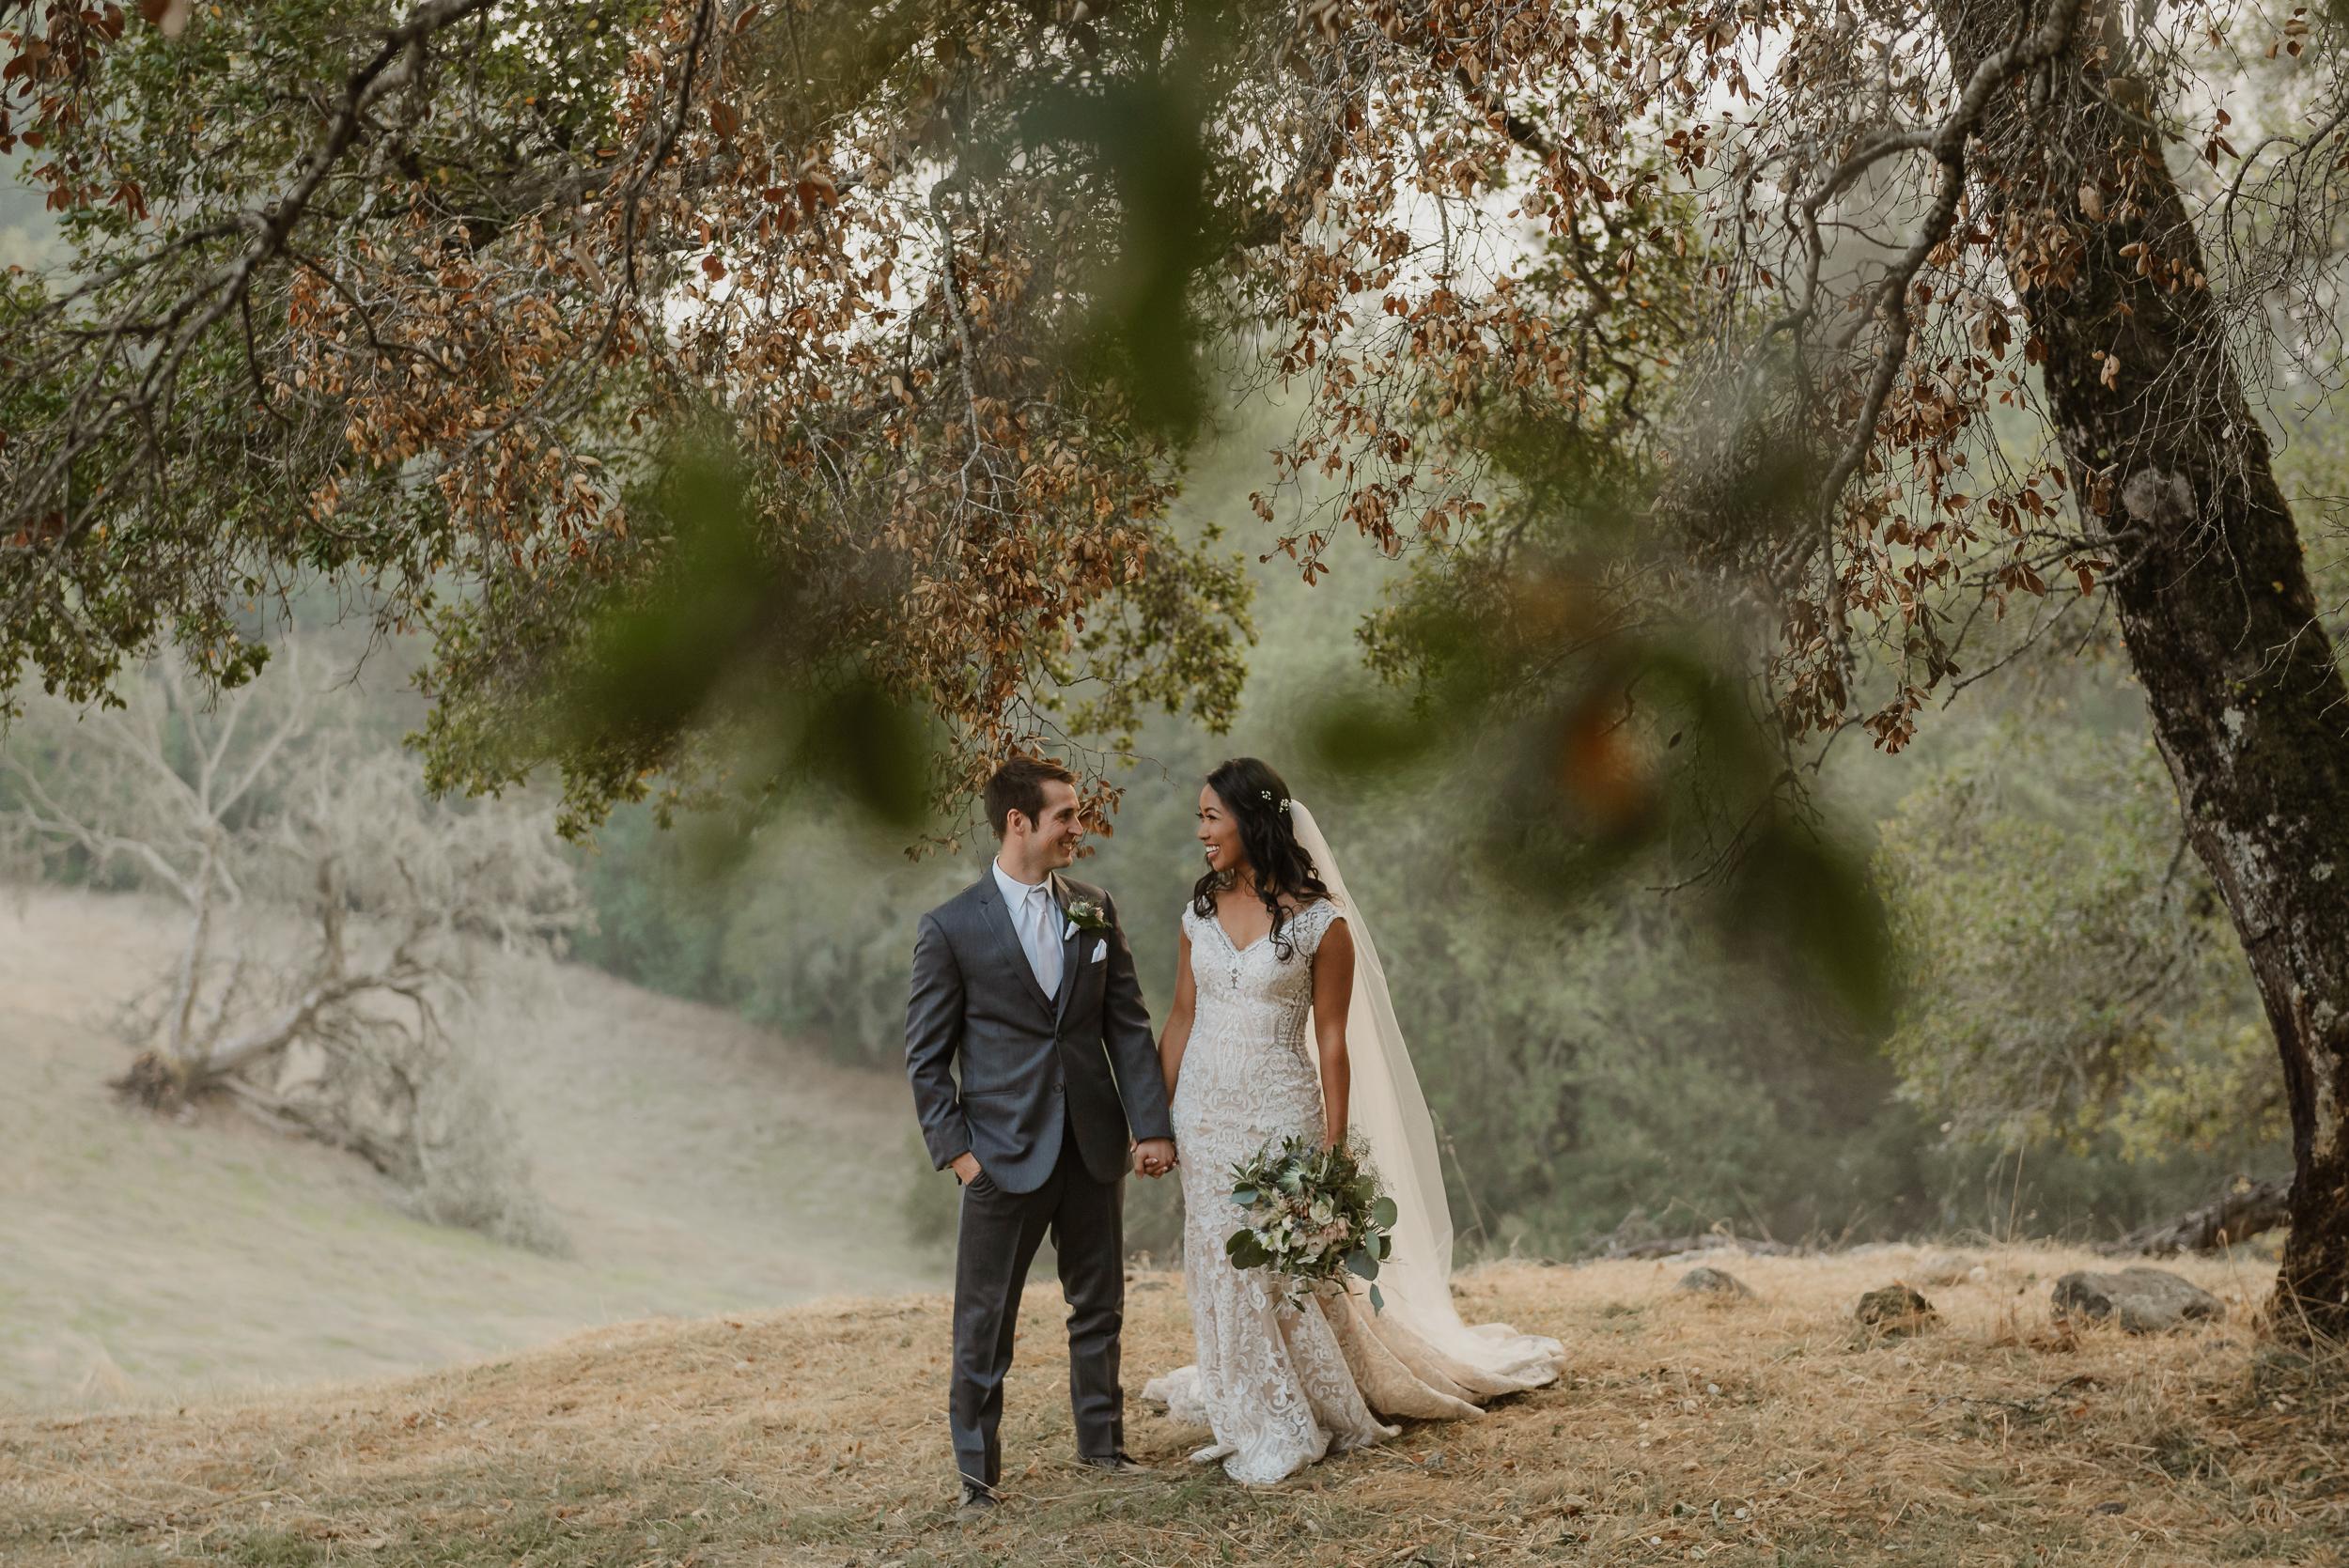 065marin-petaluma-backyard-wedding-vivianchen-463.jpg